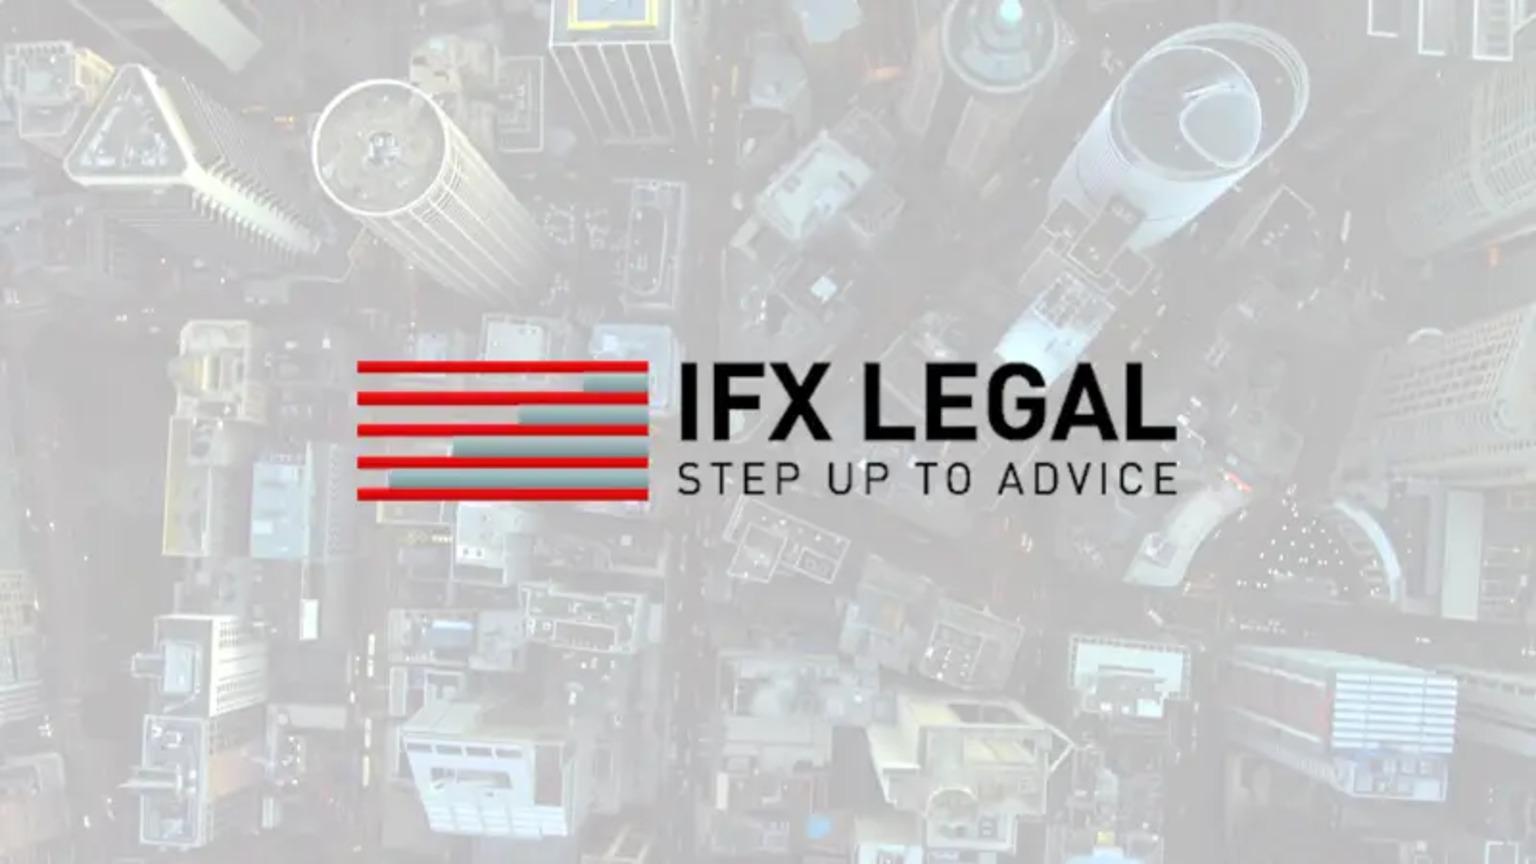 IFX Legal